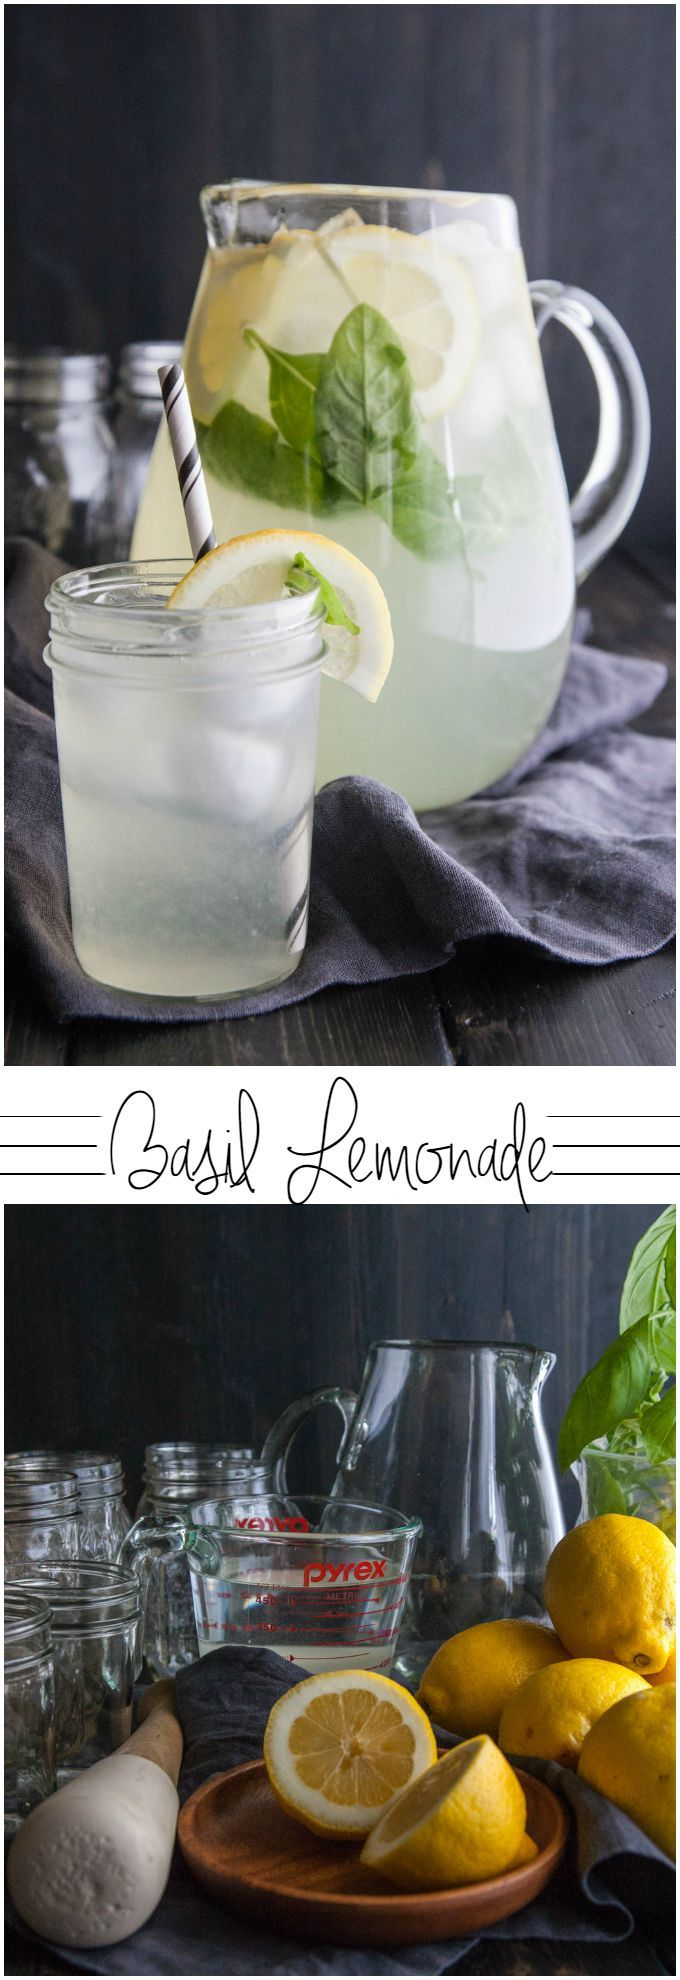 Basil lemonade from @sweetphi , lemonade recipe